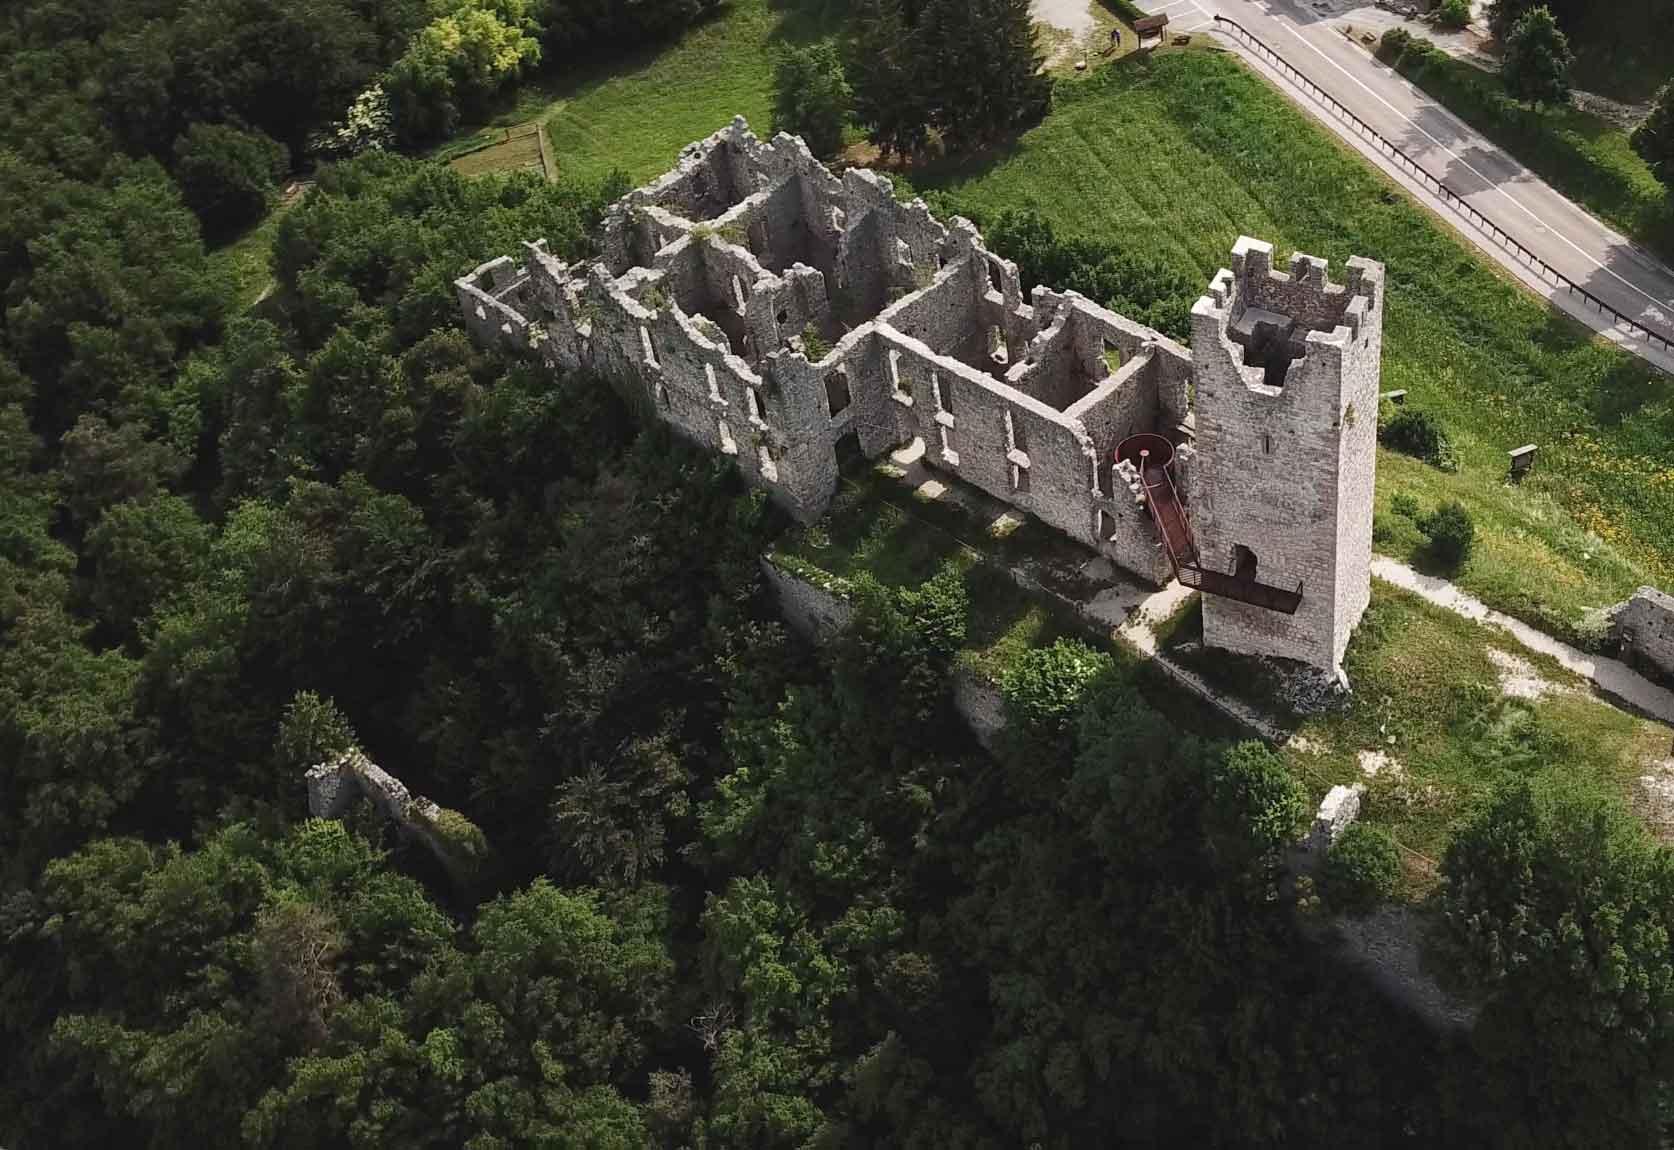 Belfort Castle from above in the Italian Alps.